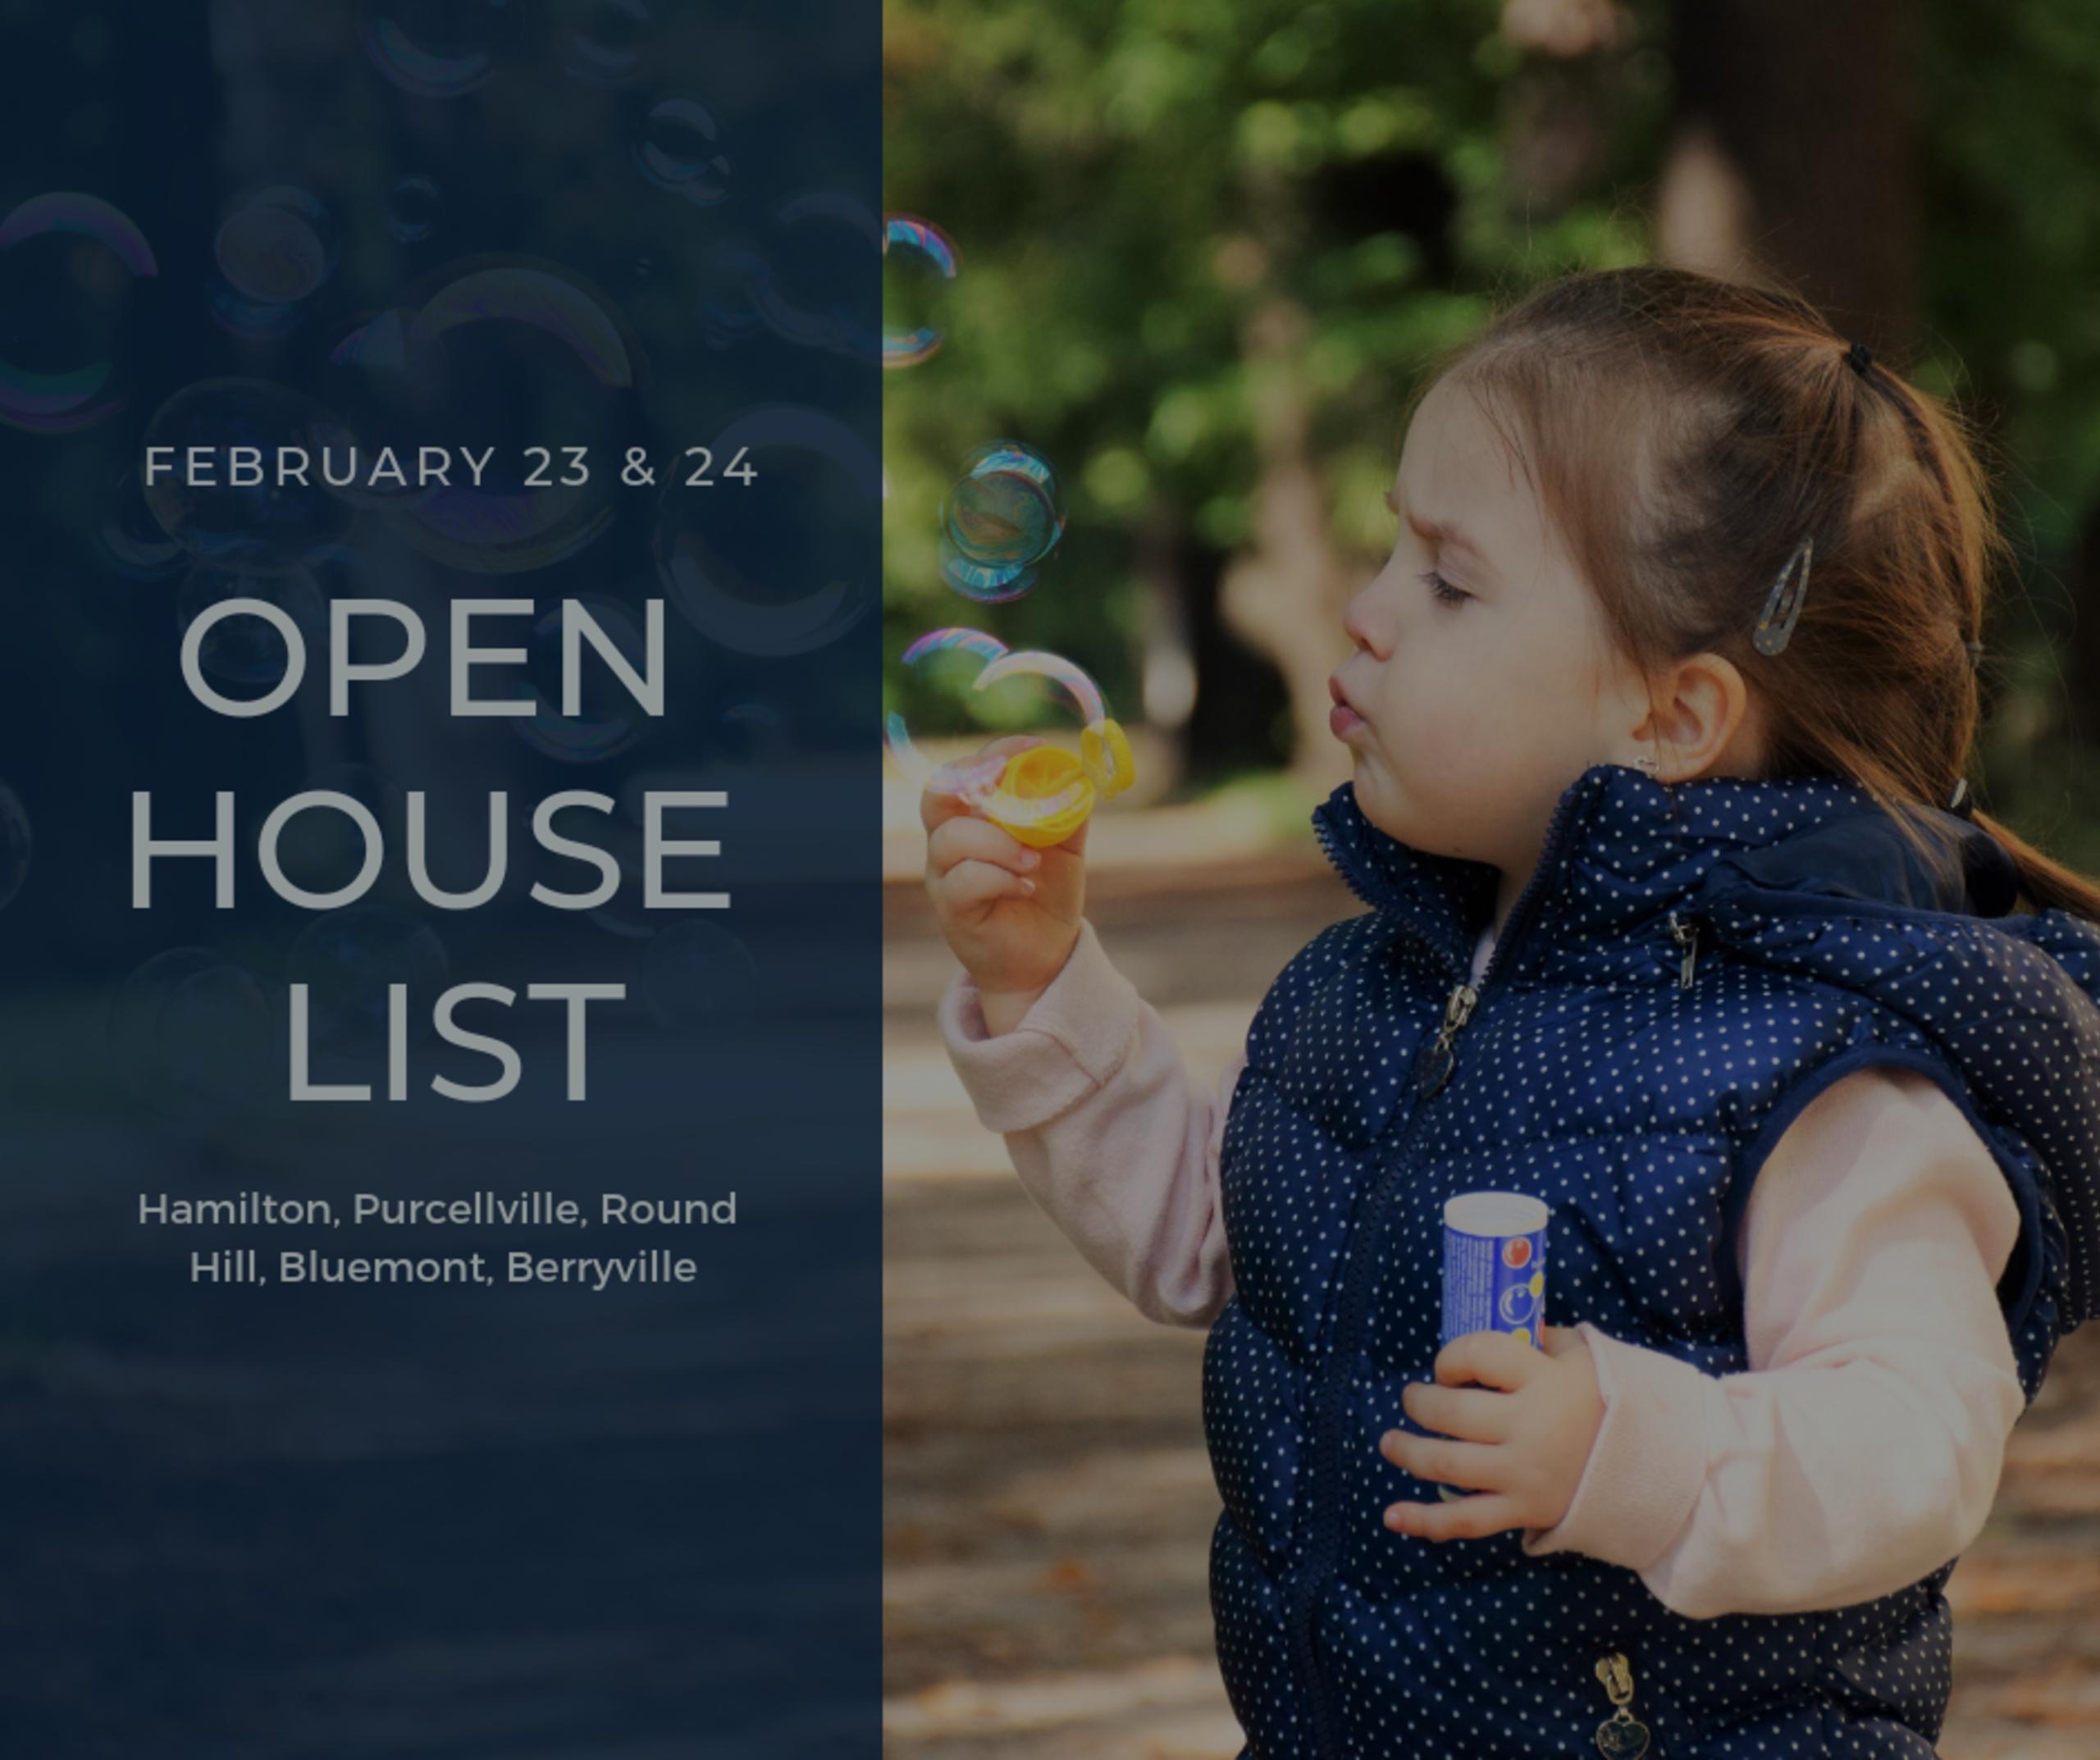 Open House List 2/23/19 – 2/24/19